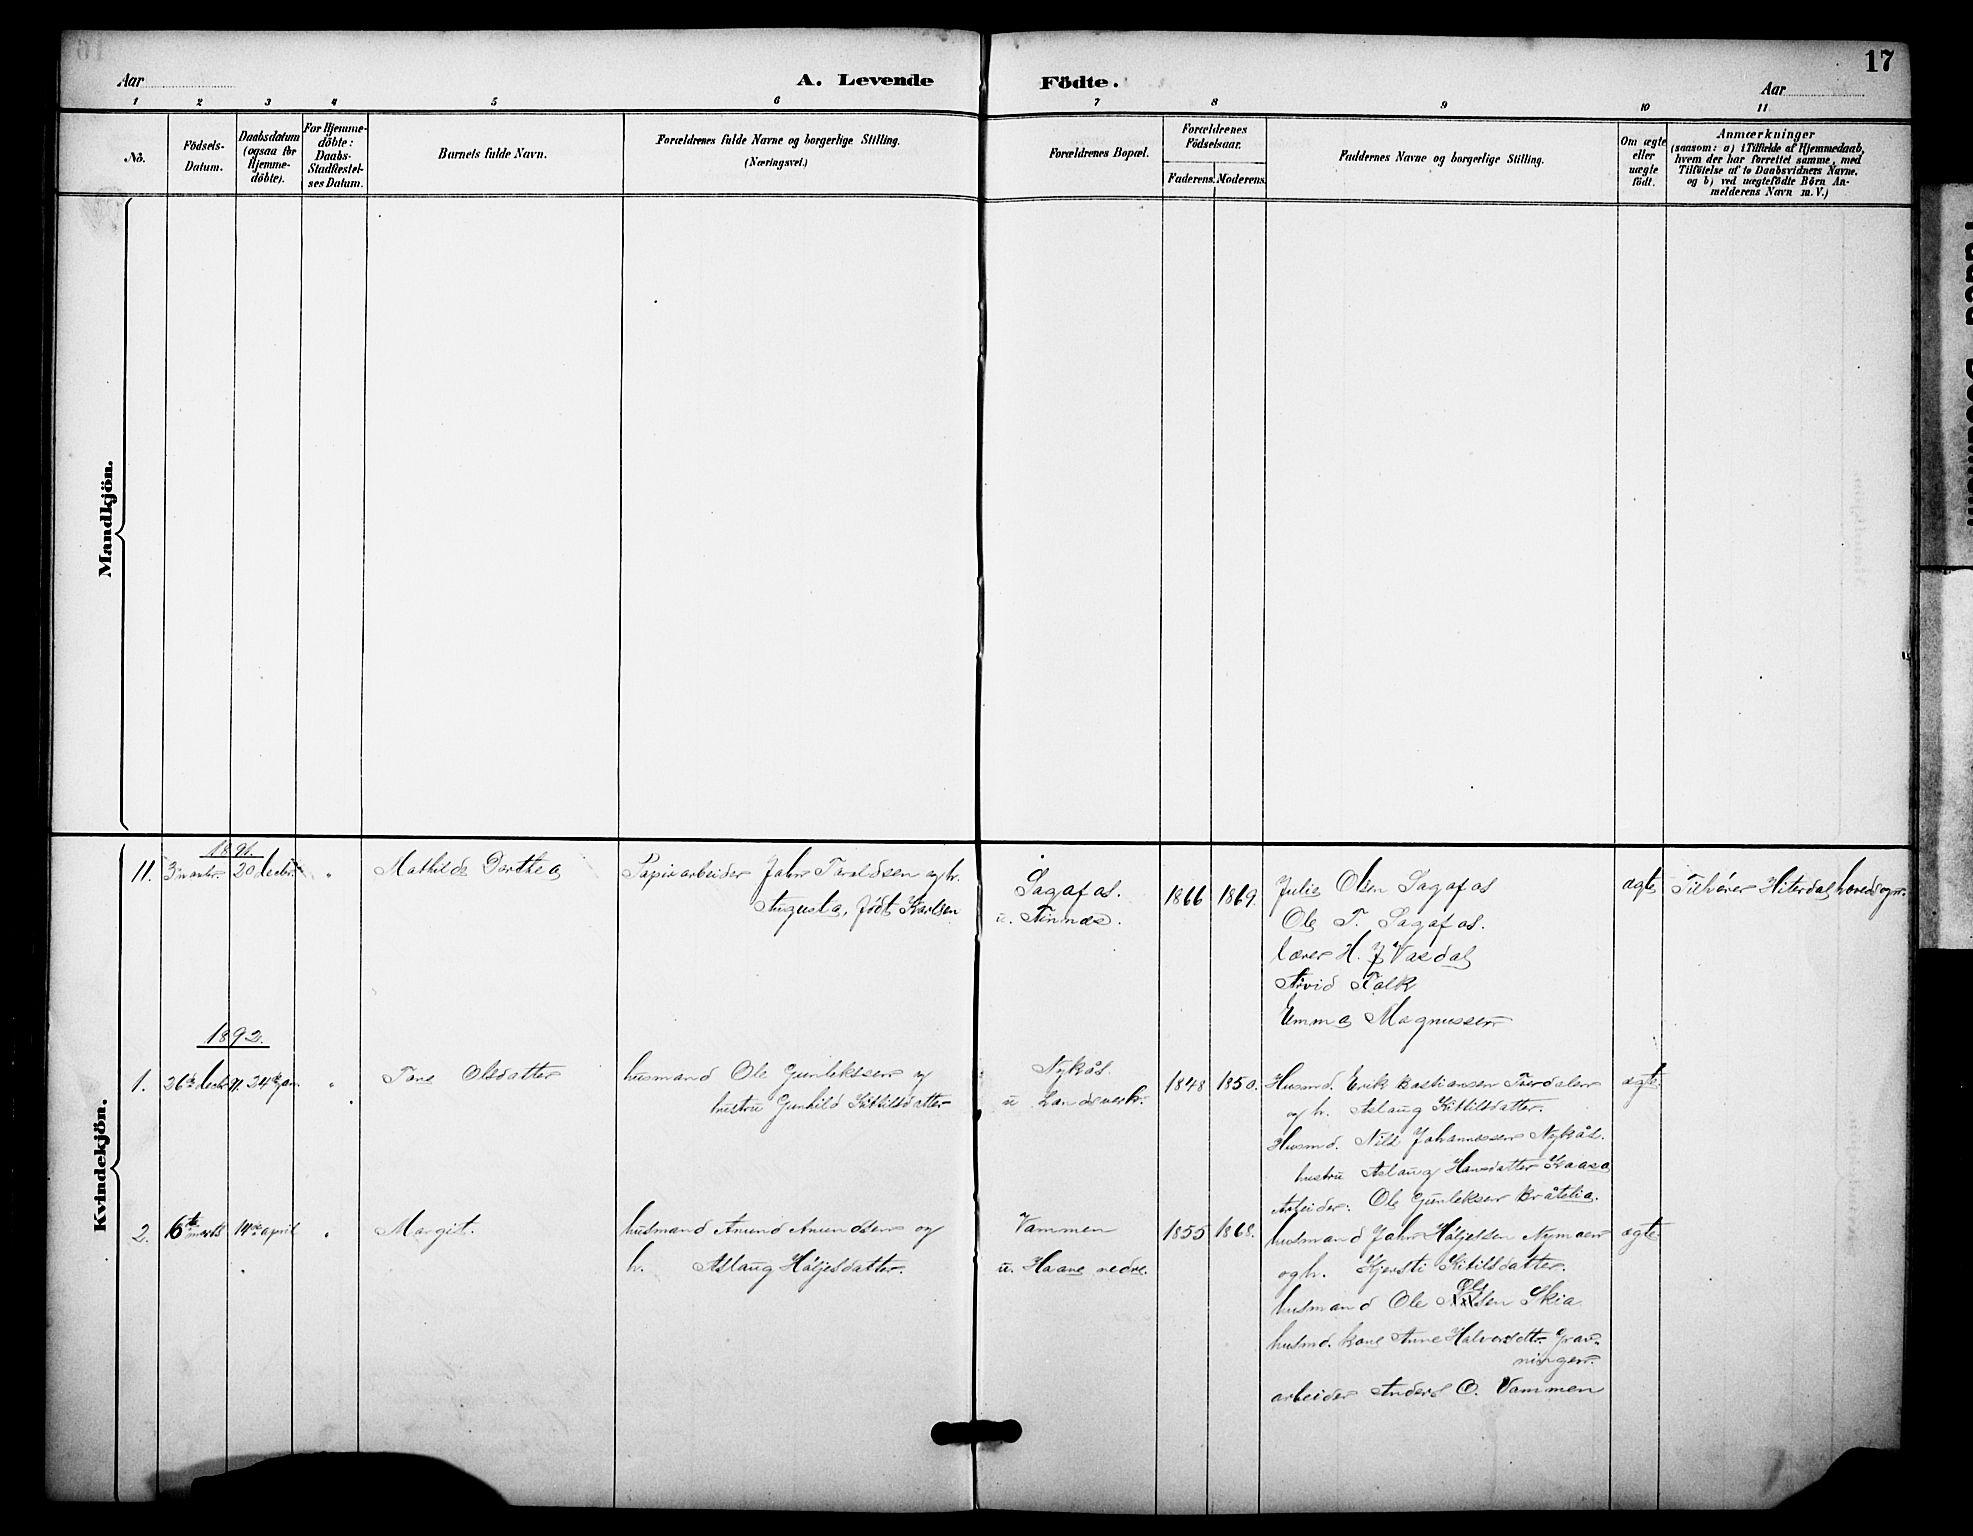 SAKO, Heddal kirkebøker, F/Fb/L0001: Ministerialbok nr. II 1, 1884-1910, s. 17